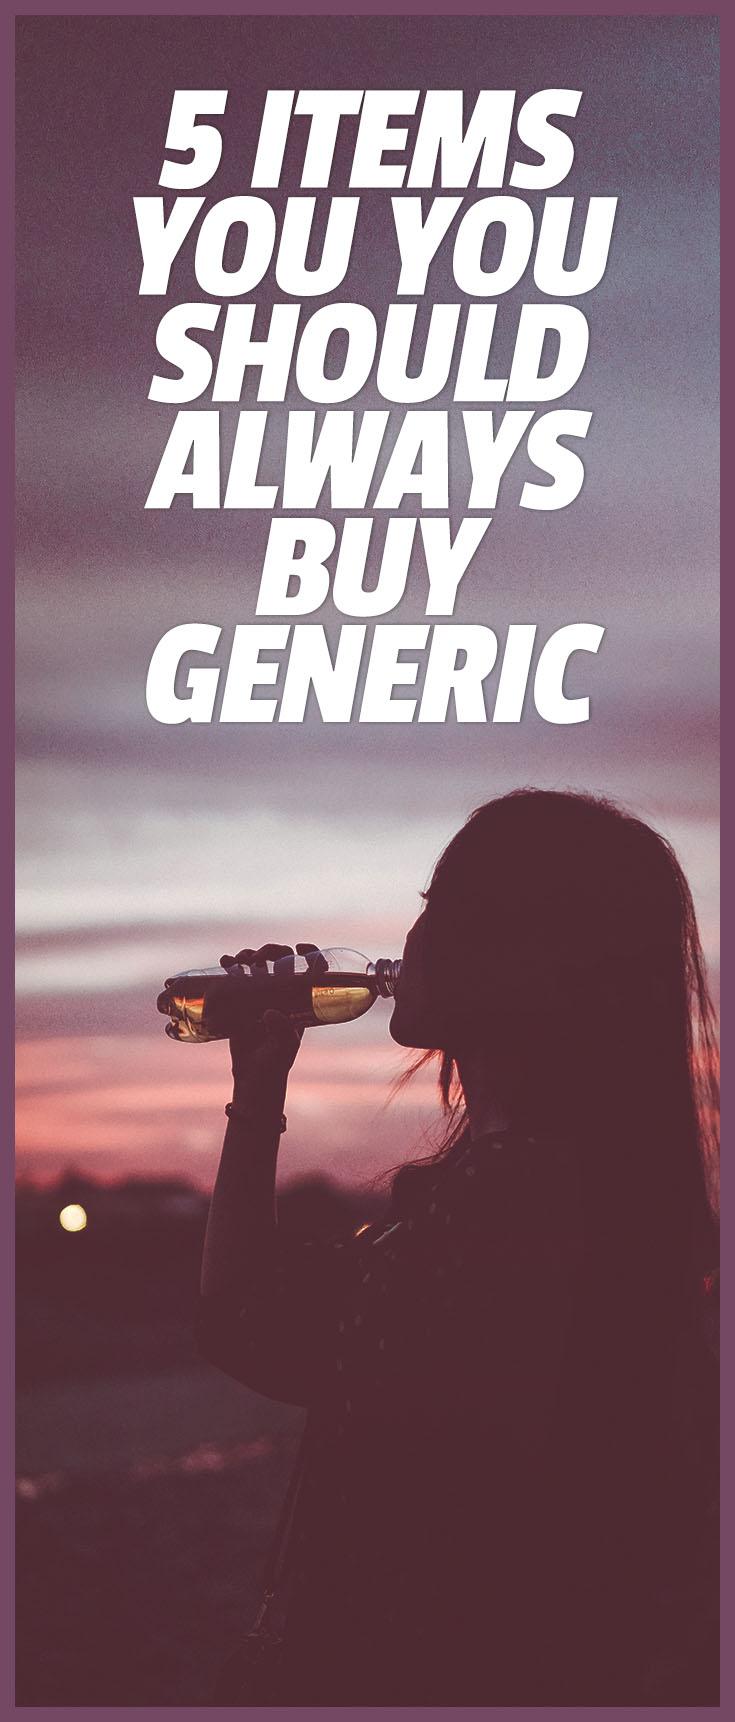 items to buy generic